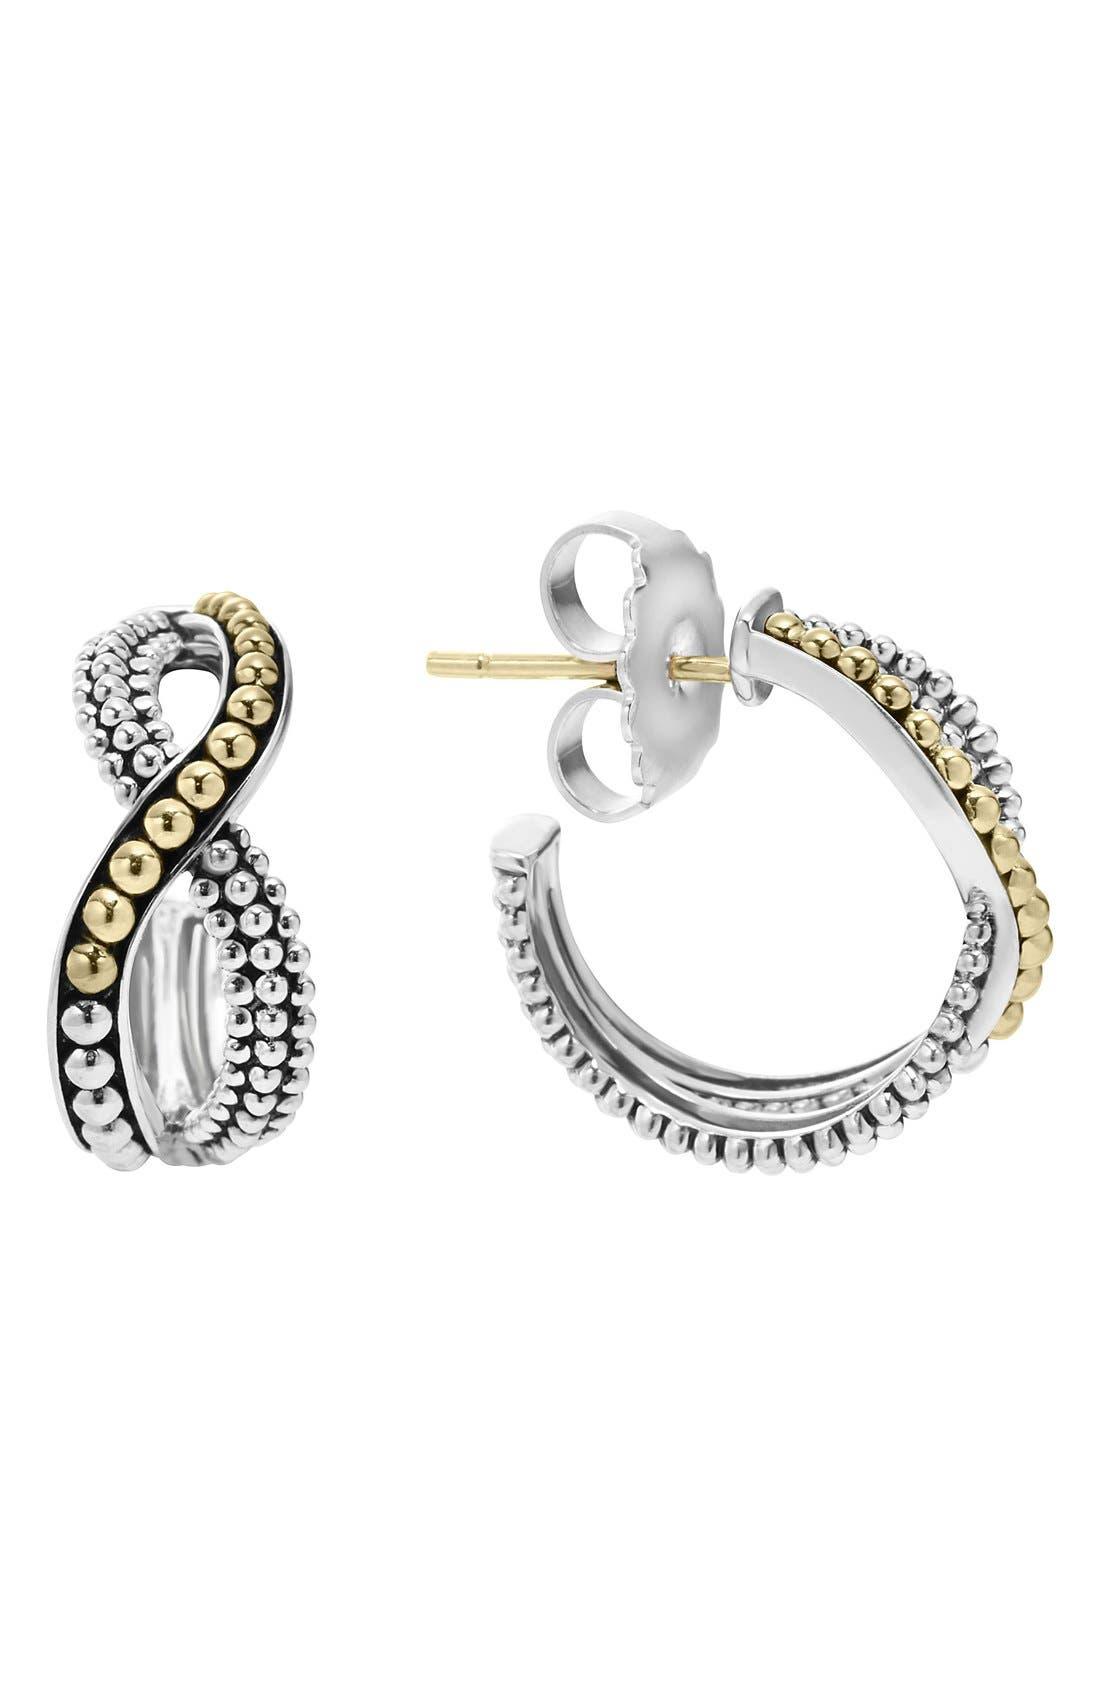 LAGOS Infinity Double Twist Hoop Earrings